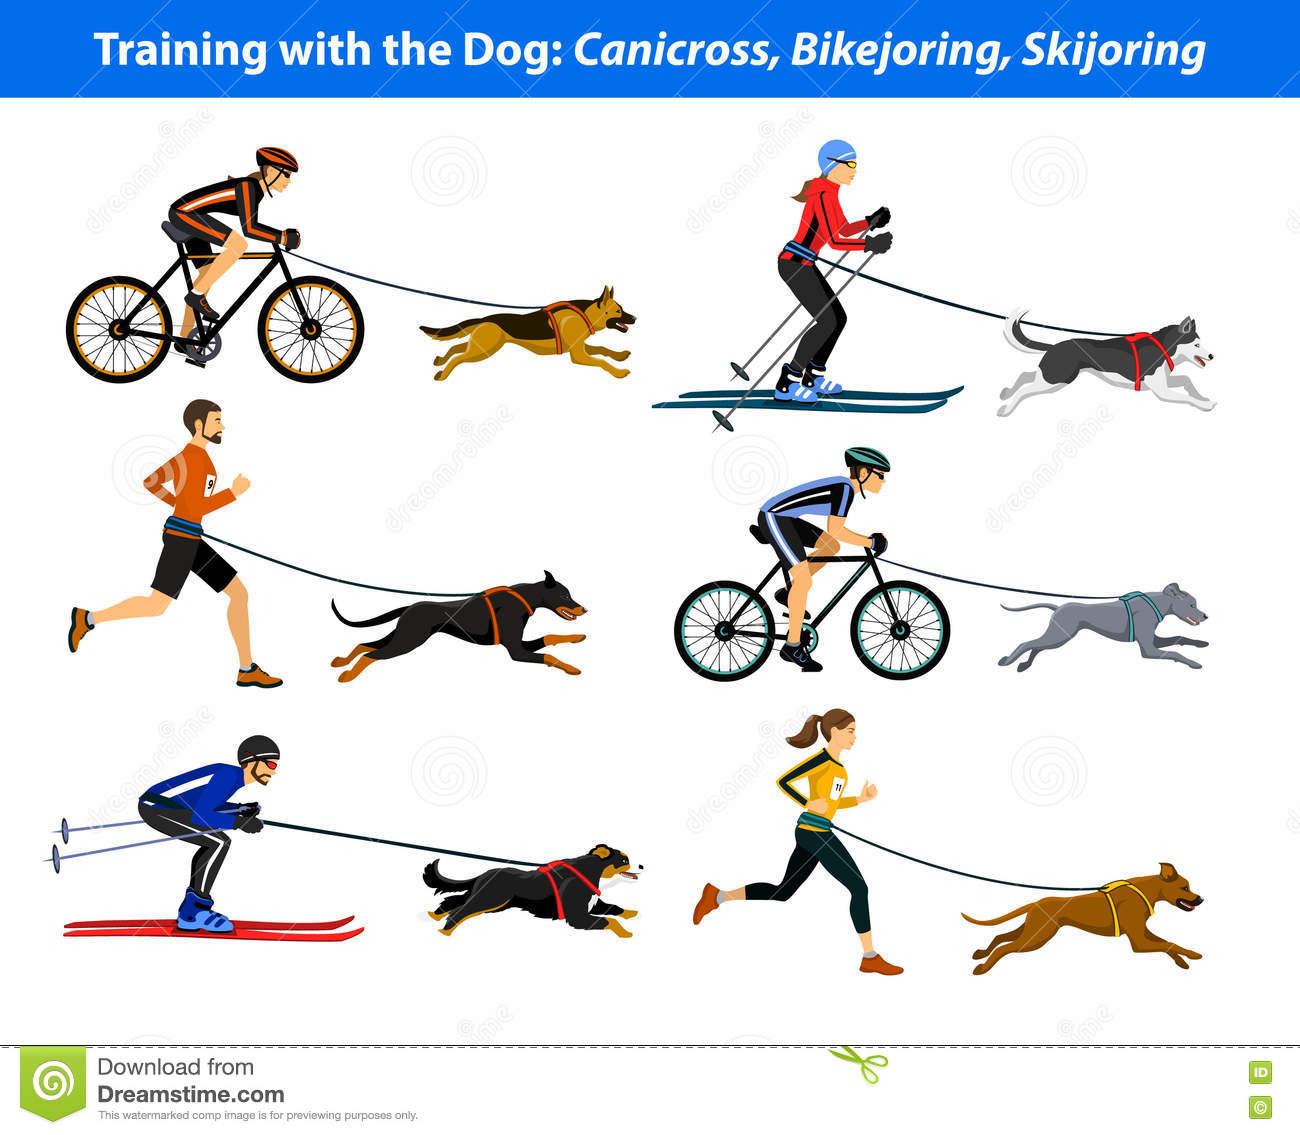 Training Exercising With Dog: Canicross, Bikejoring, Skijoring.